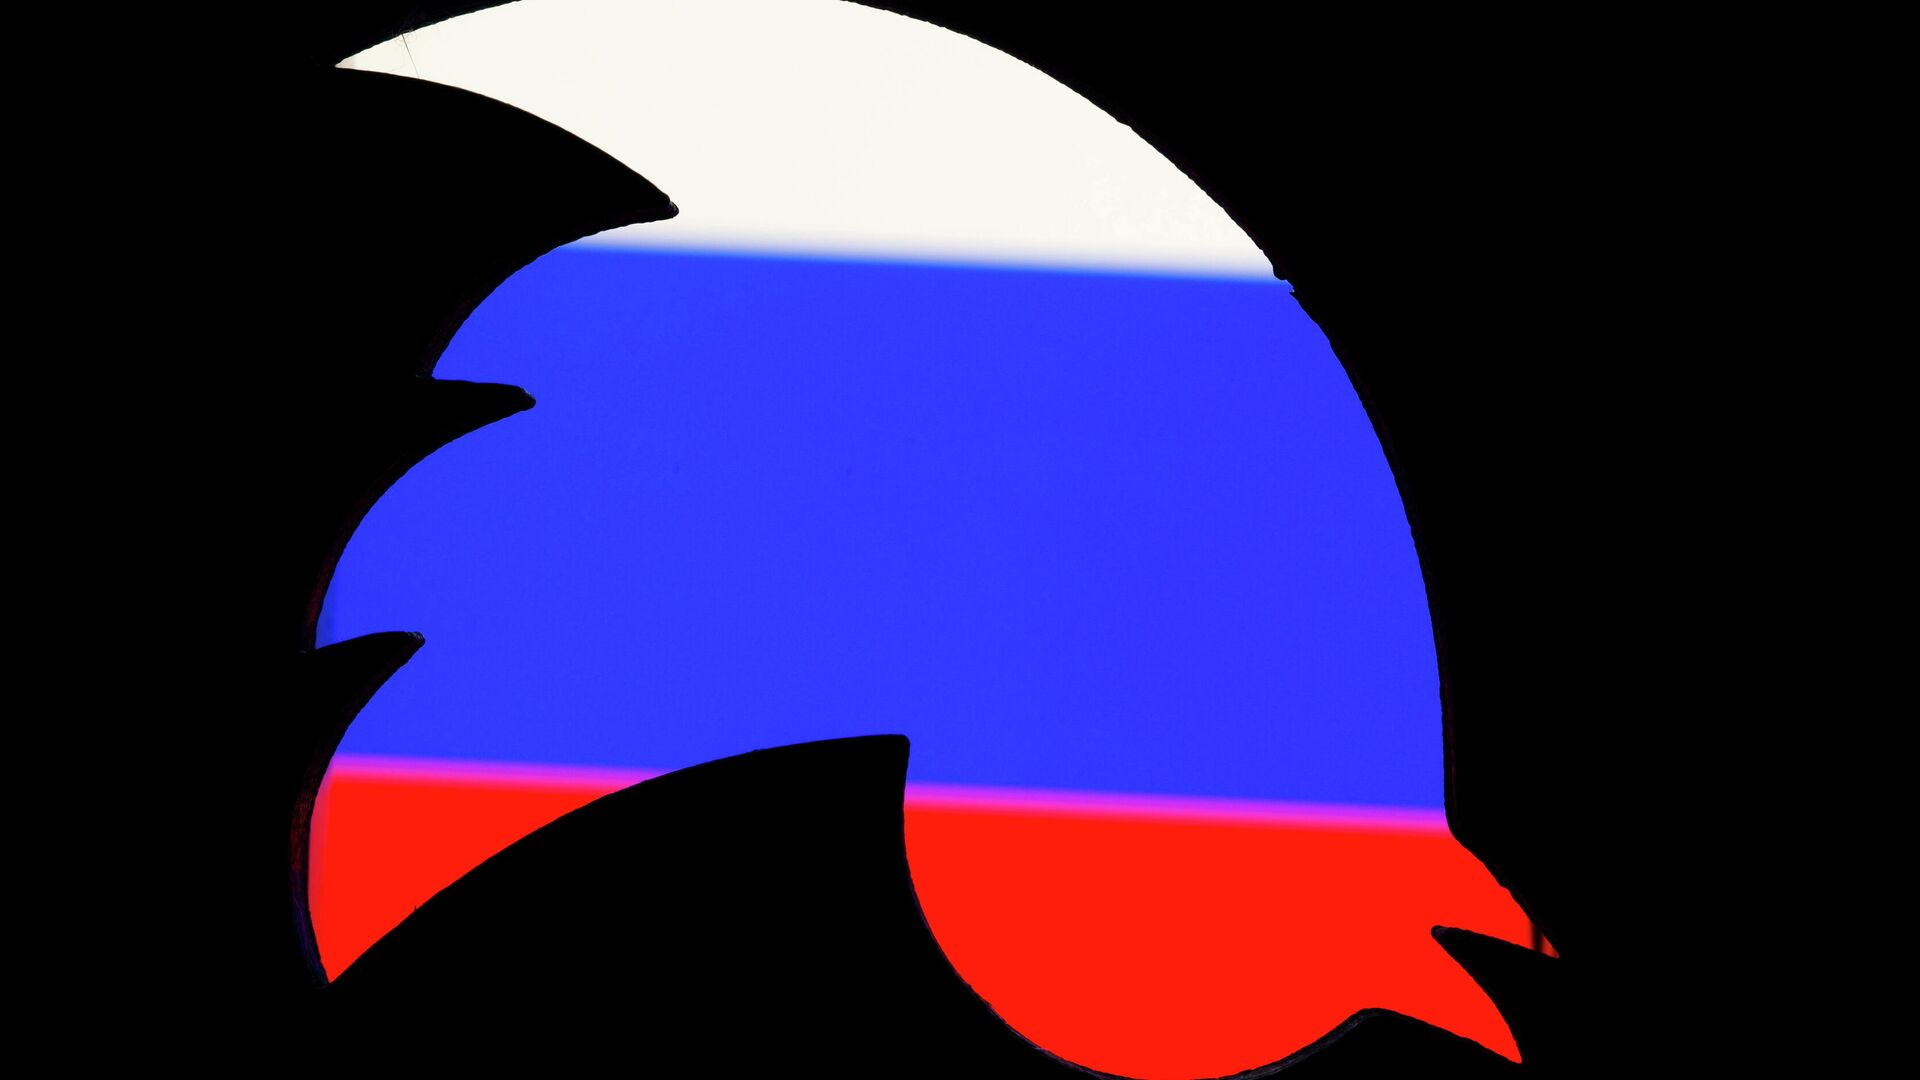 Logo de Twitter y la bandera de Rusia - Sputnik Mundo, 1920, 02.04.2021